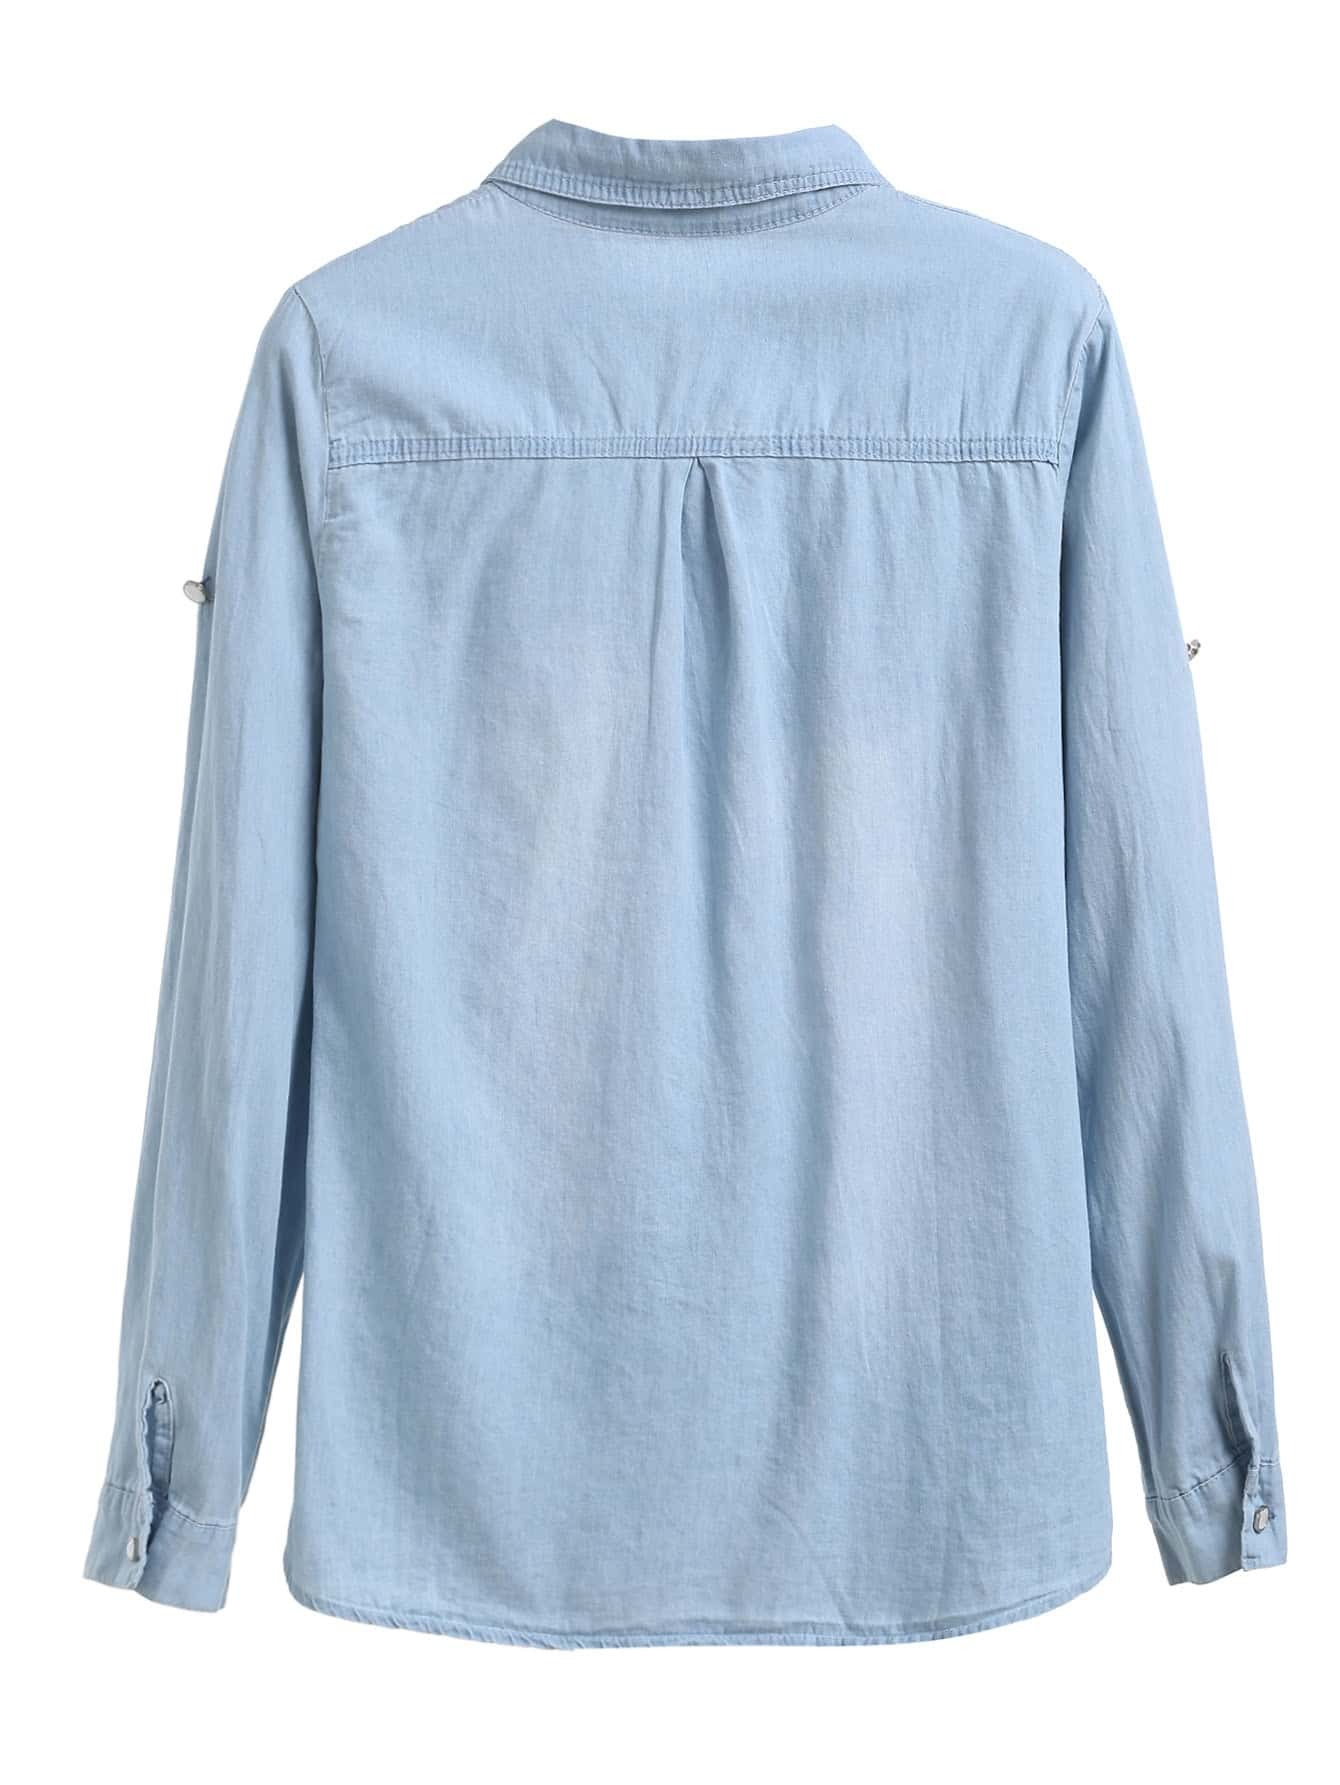 blouse160905102_2